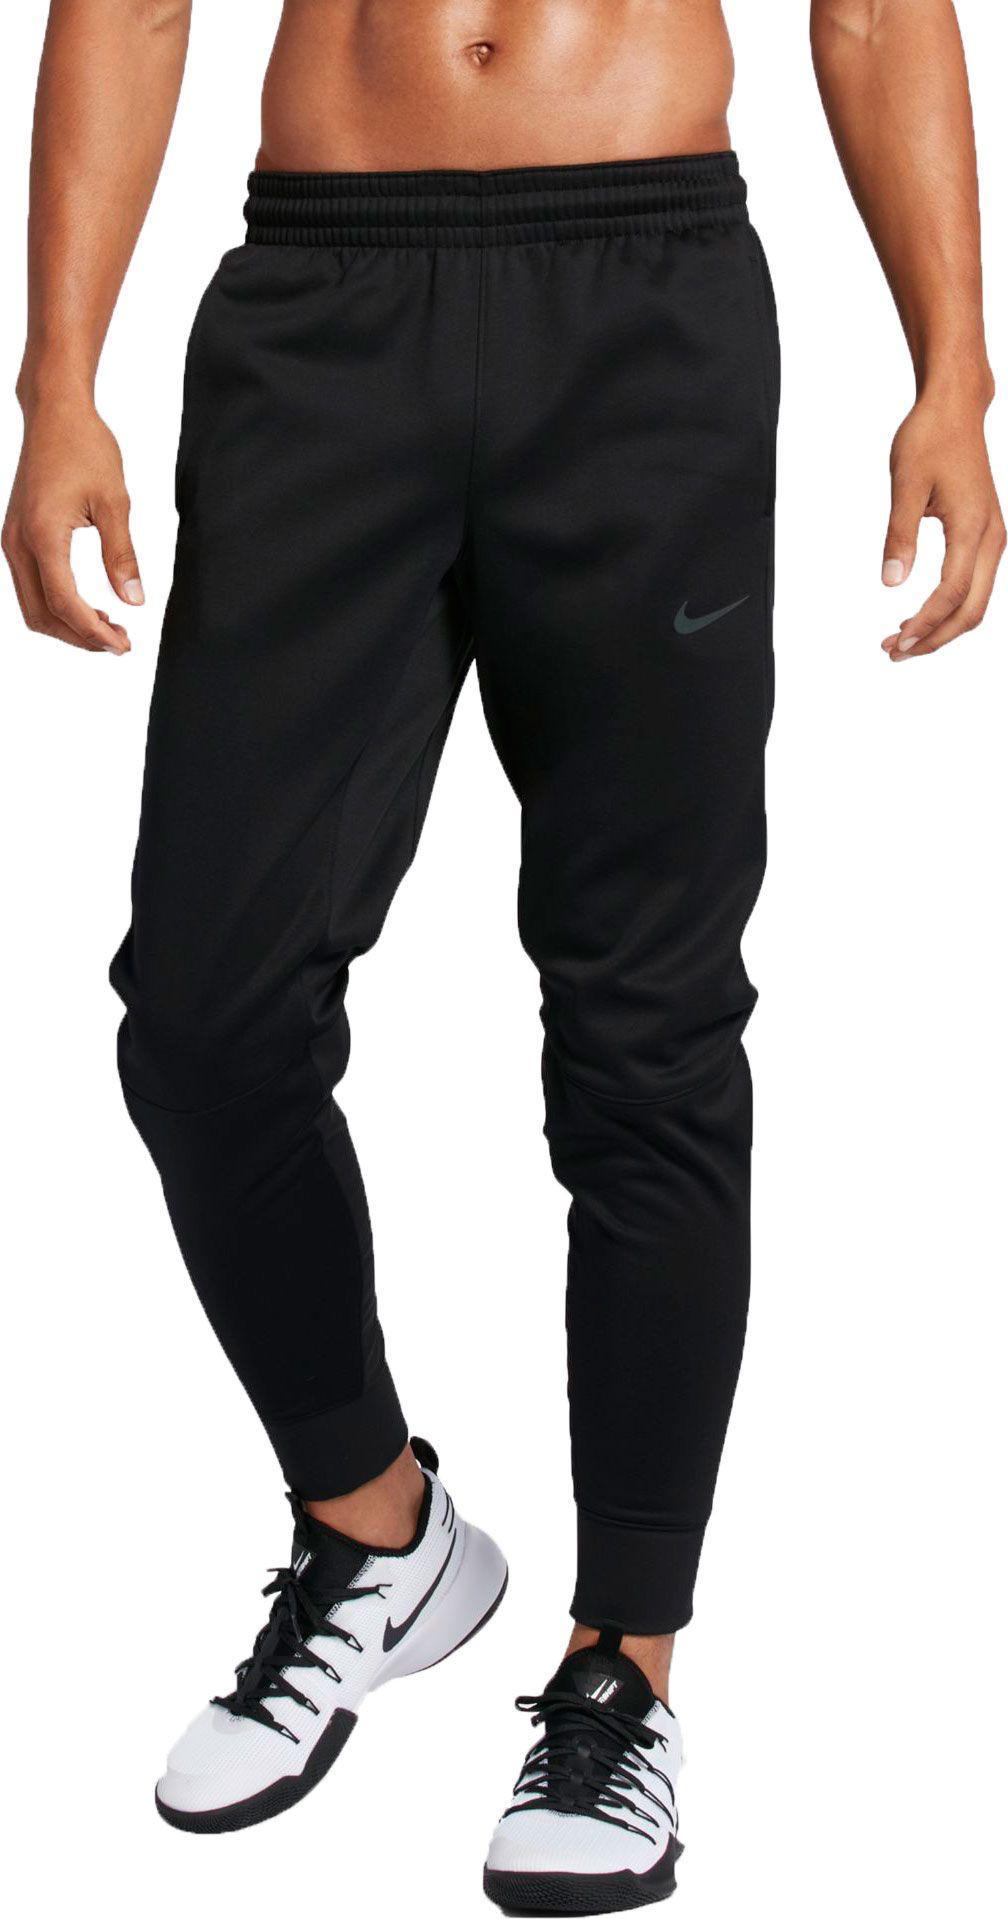 2d9a159d4978 Lyst - Nike Therma Hyper Elite Basketball Pants in Black for Men